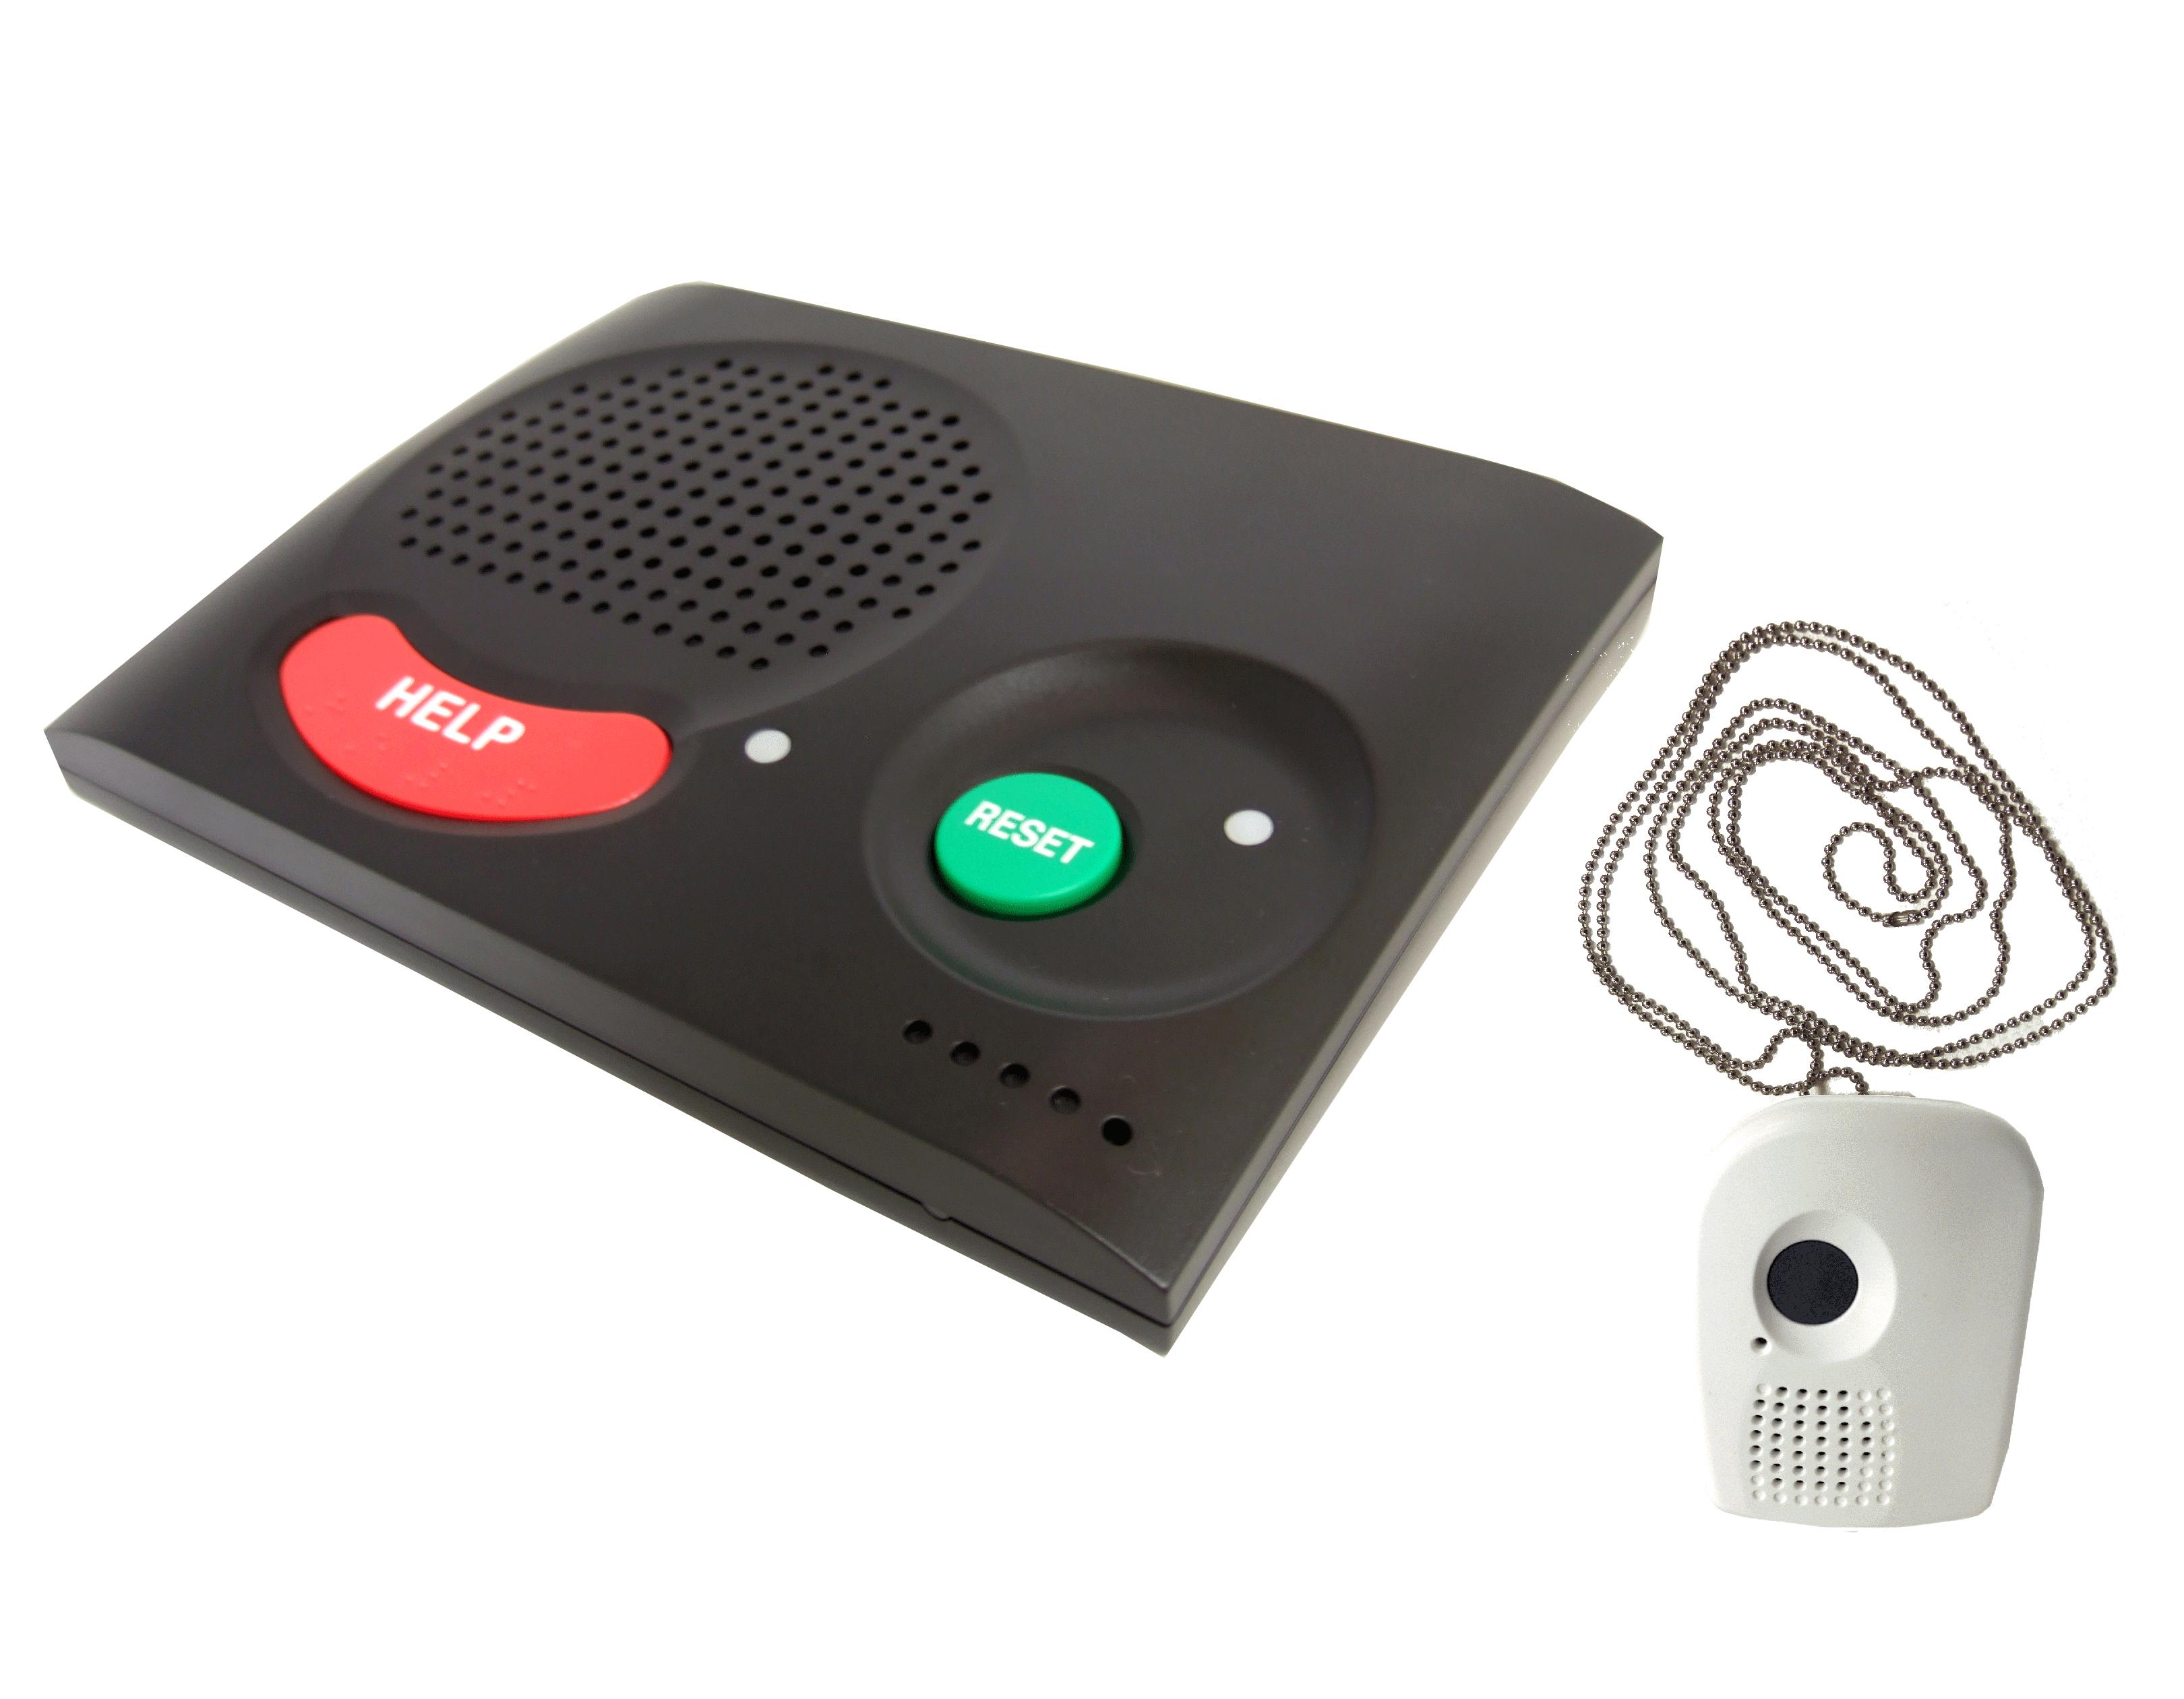 CTC - 1052 RV Talking Pendant